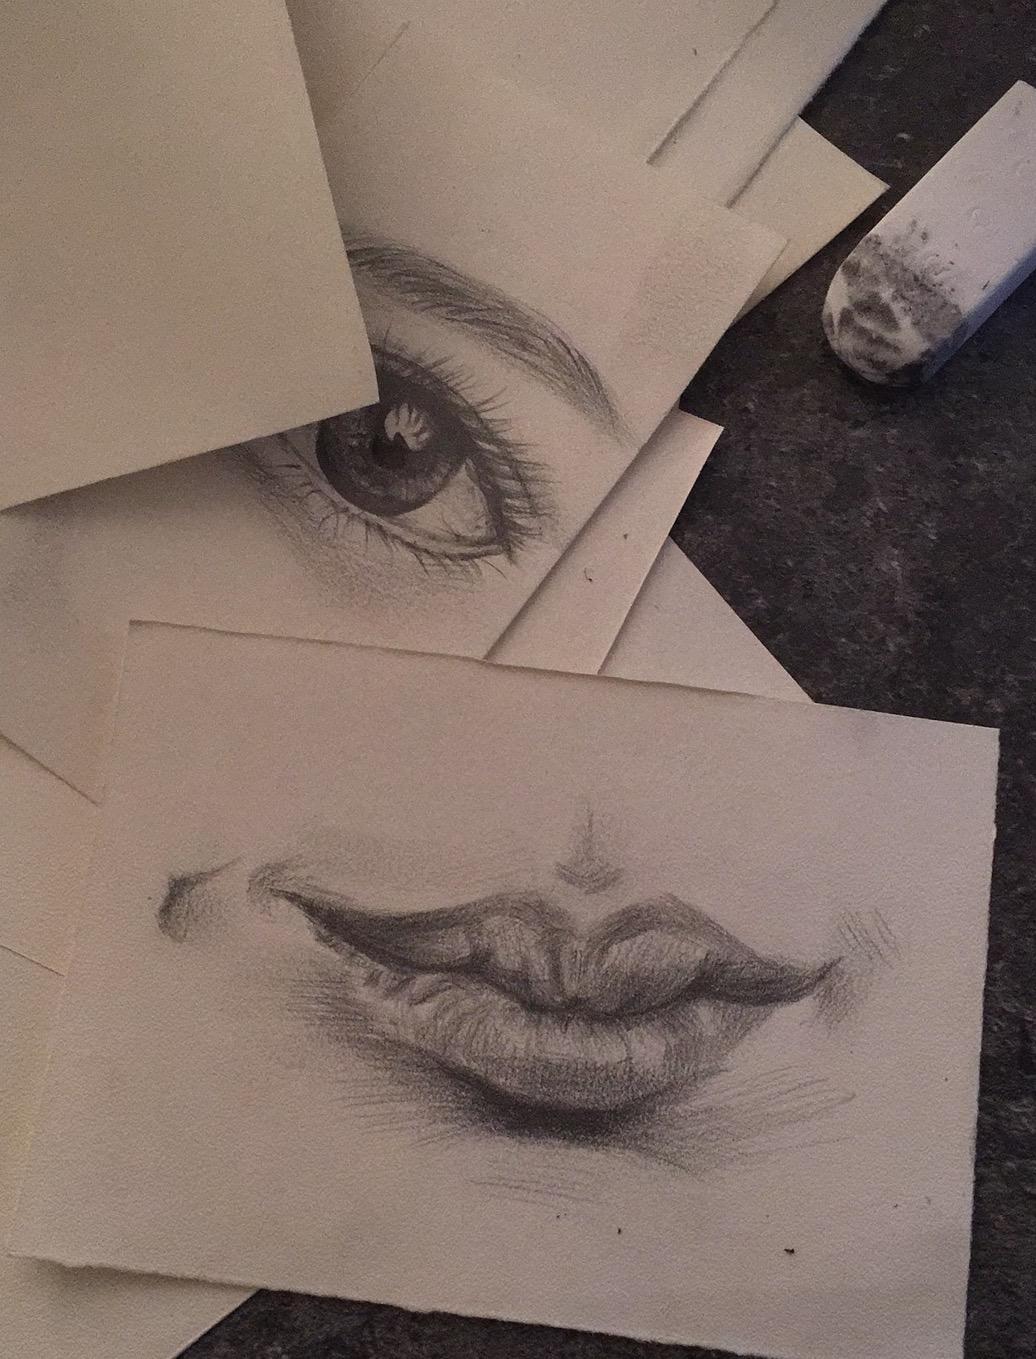 Bridge 2 || Final Draft: Portrait as Identity